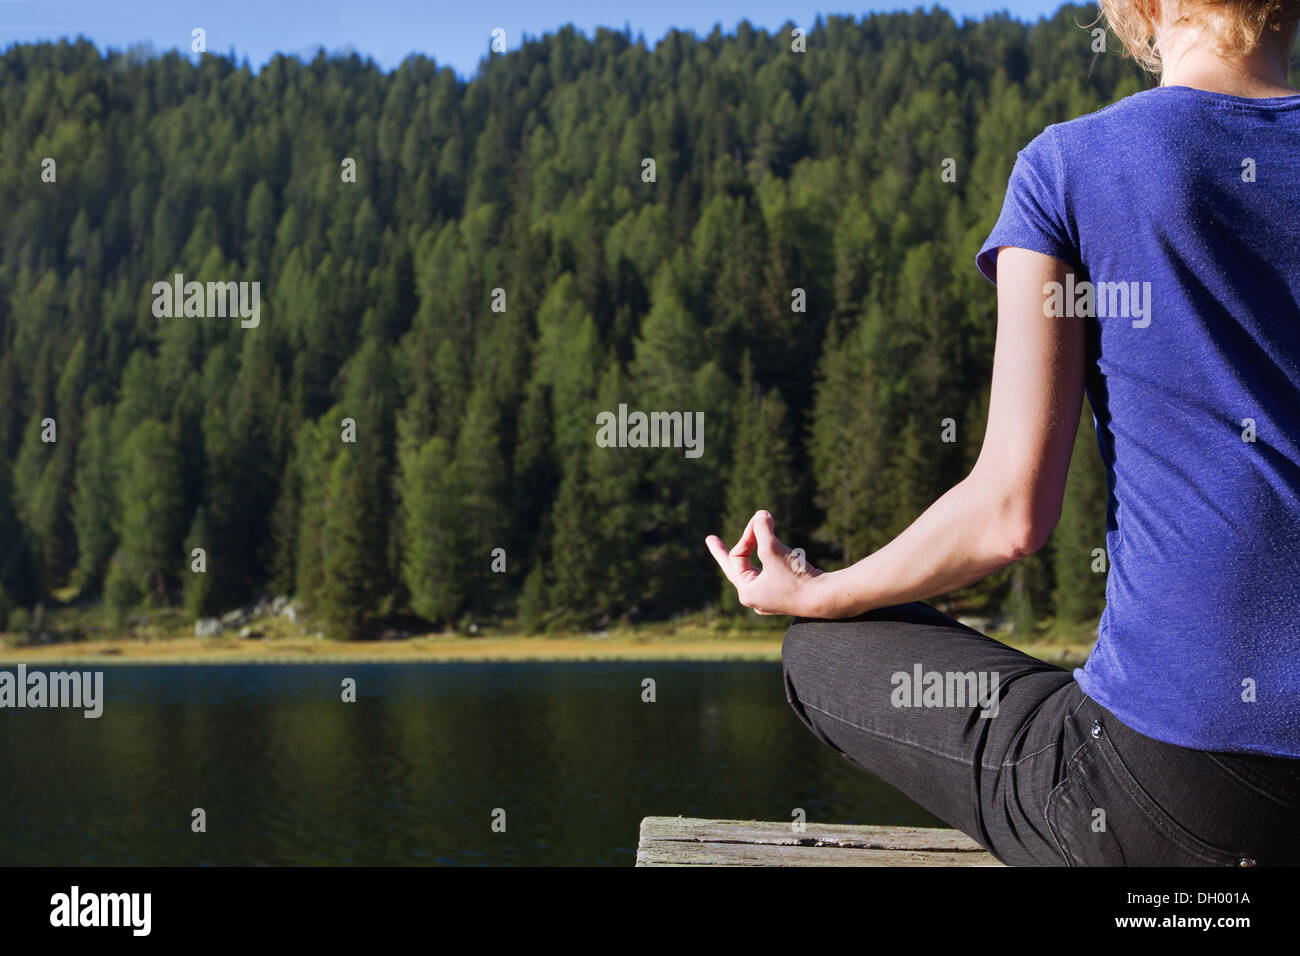 yoga and meditation near mountain lake - Stock Image